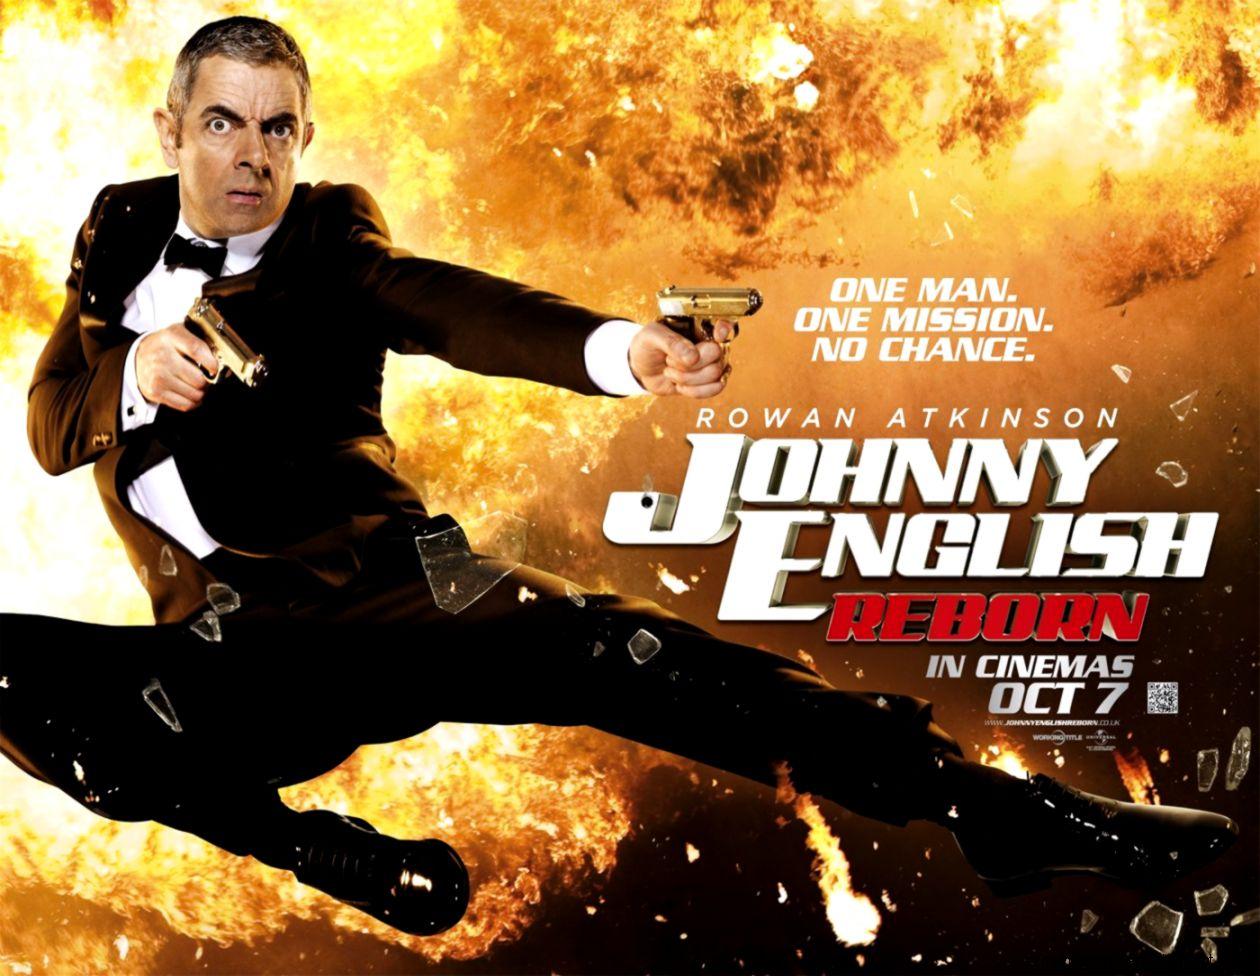 Johnny English Reborn Movie